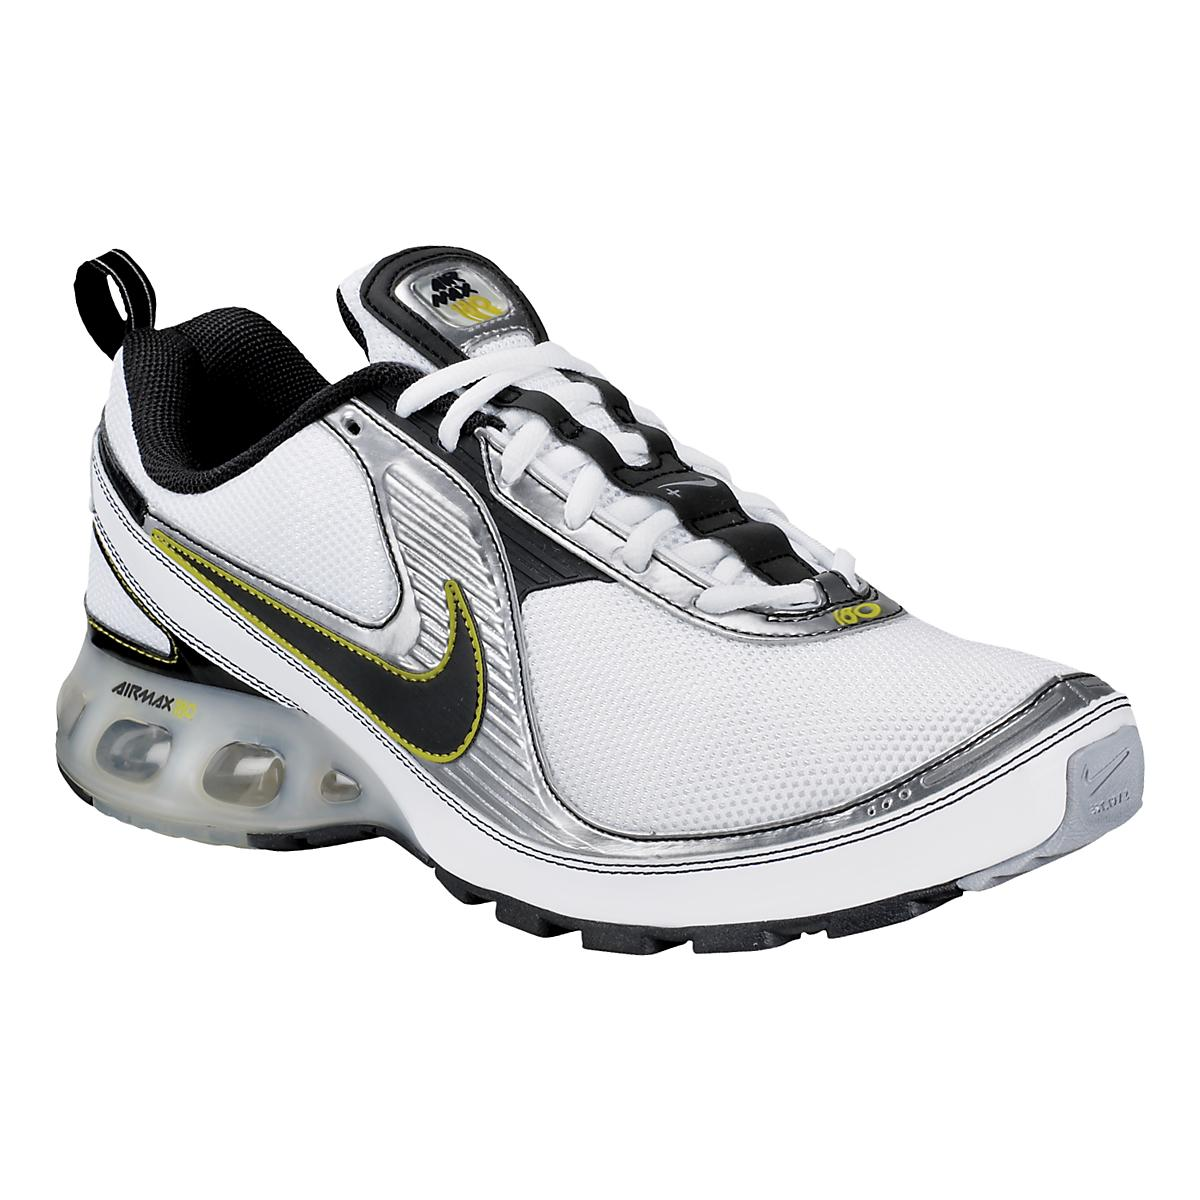 0bca79011 Mens Nike Air Max 180+ II Running Shoe at Road Runner Sports